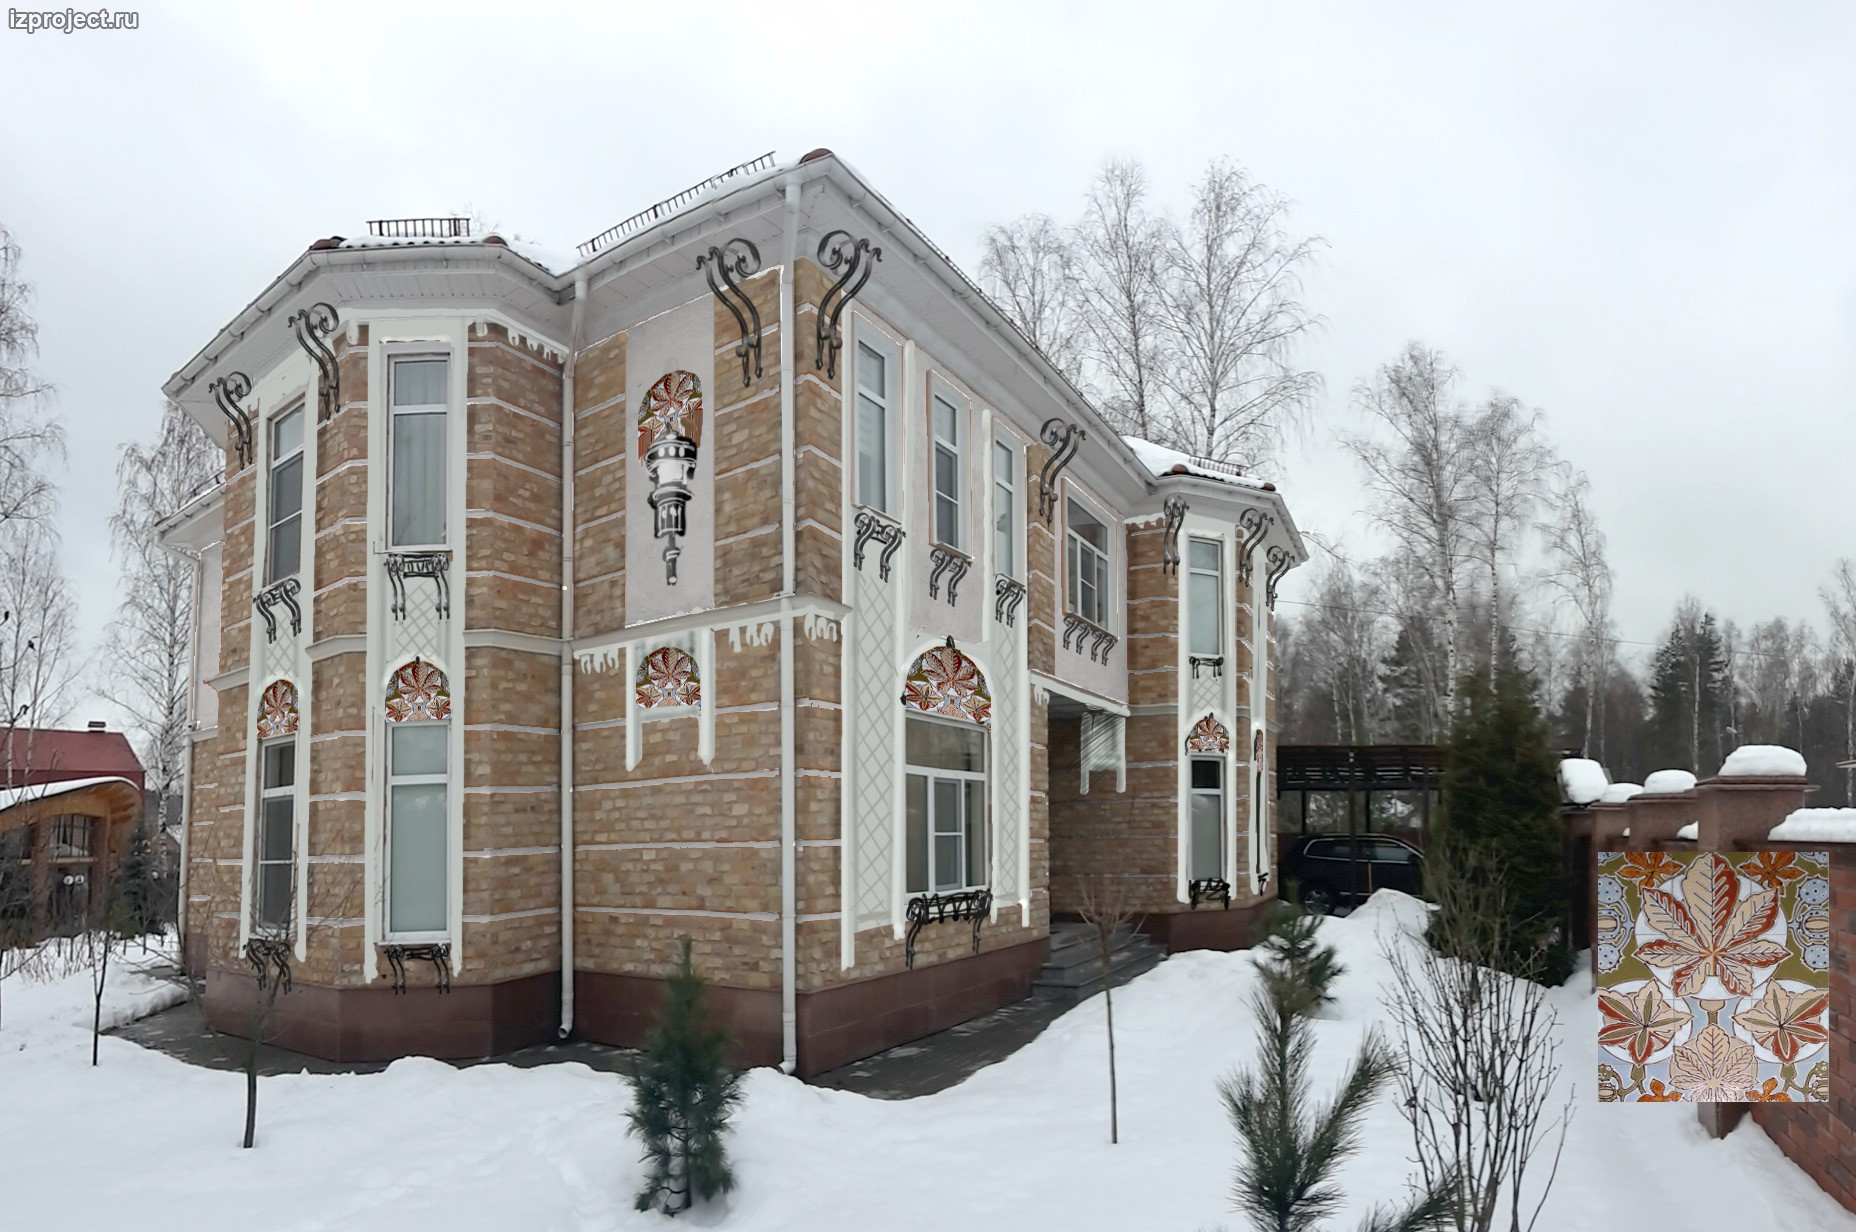 Реновация фасада кирпичного дома, вариант - штукатурка